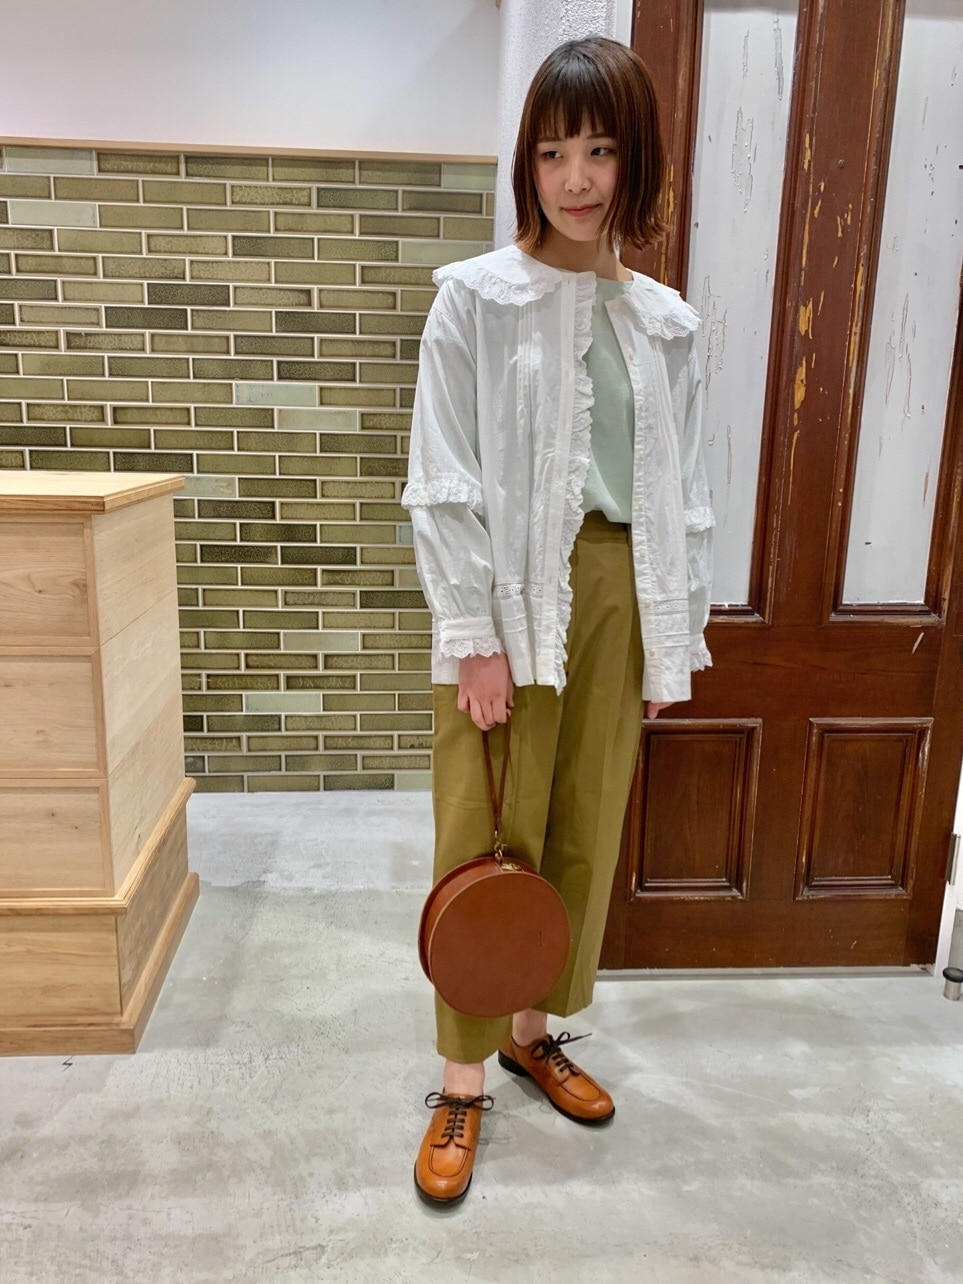 chambre de charme 横浜ジョイナス 身長:162cm 2020.02.04